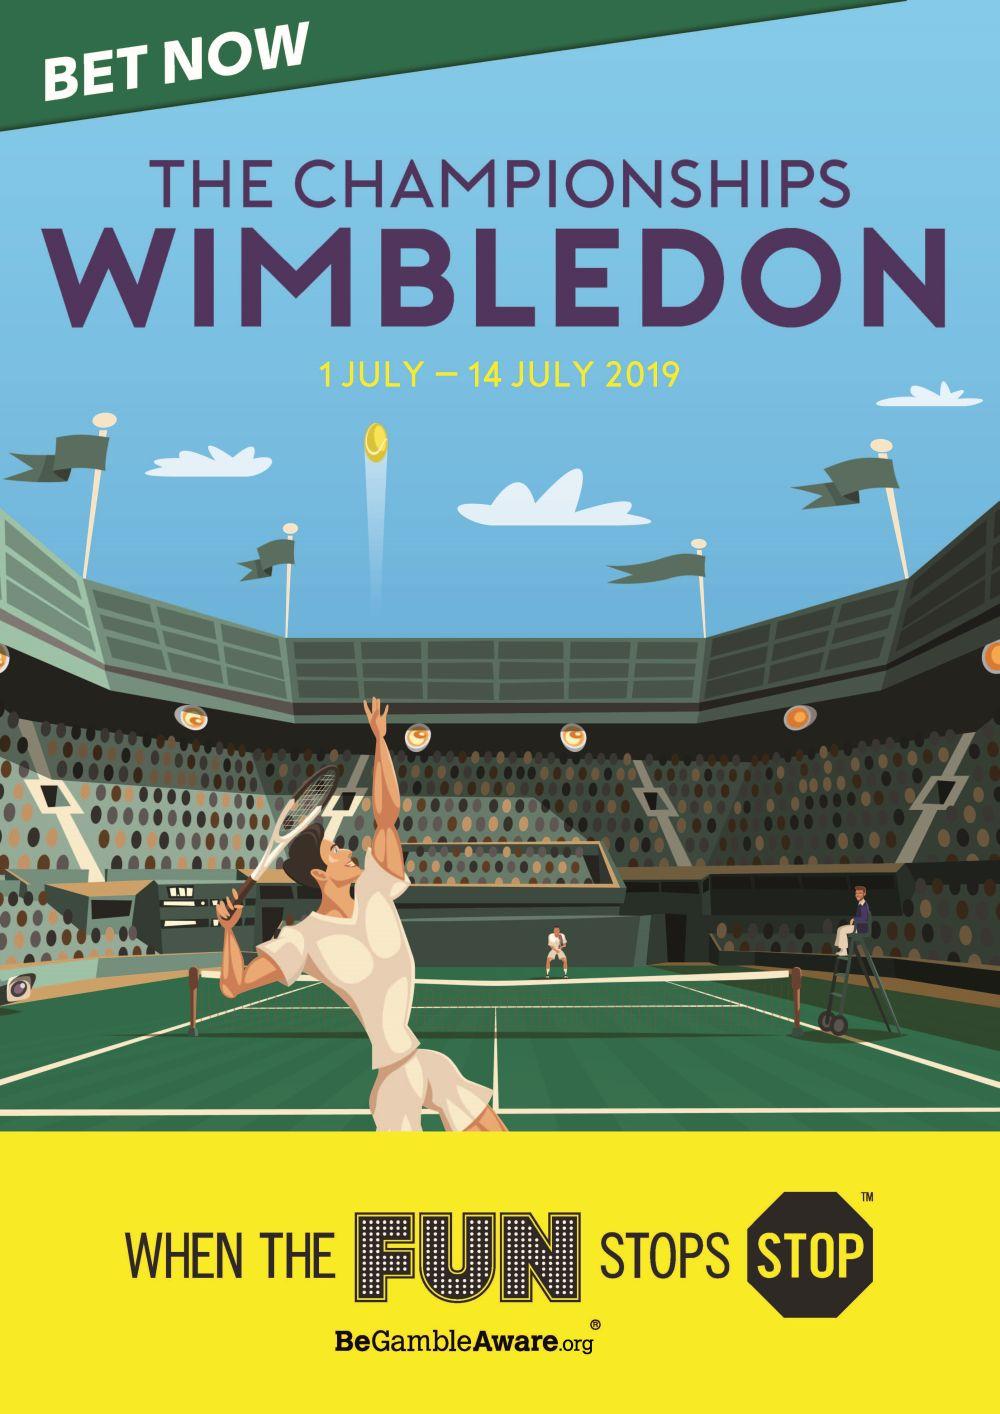 wimbledon 2019 - photo #44